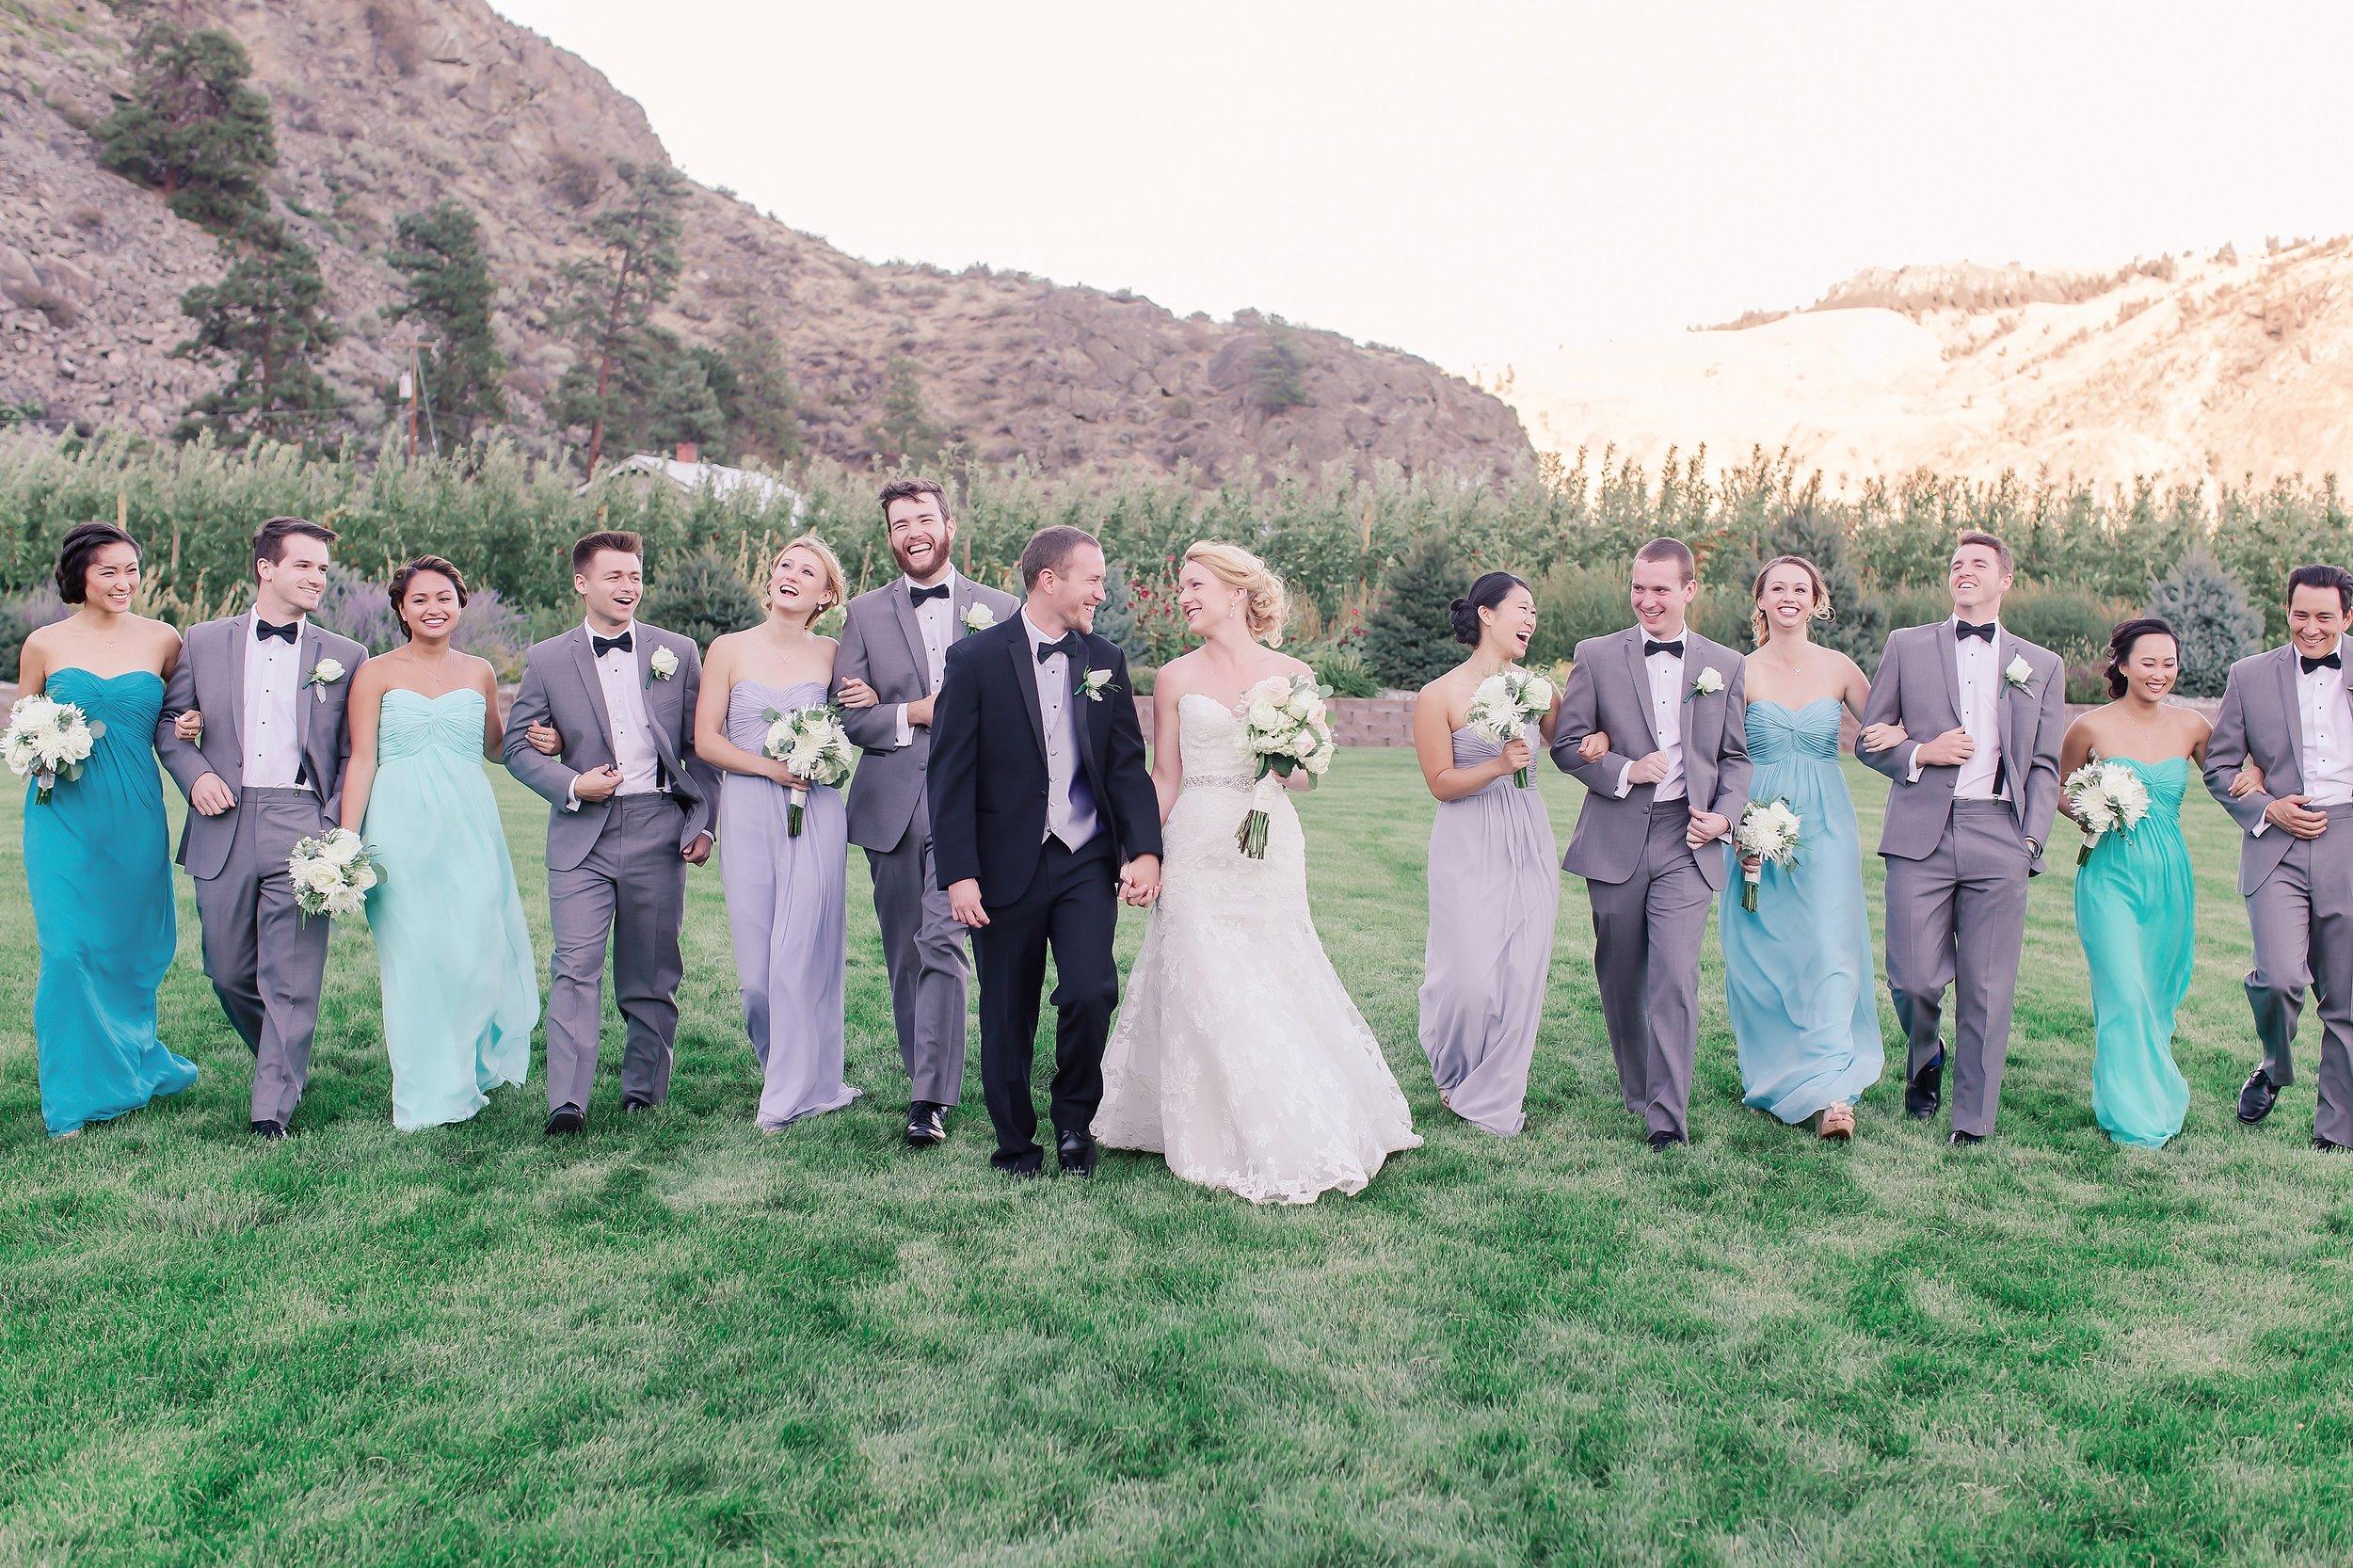 seattle wedding photographer_0399.jpg